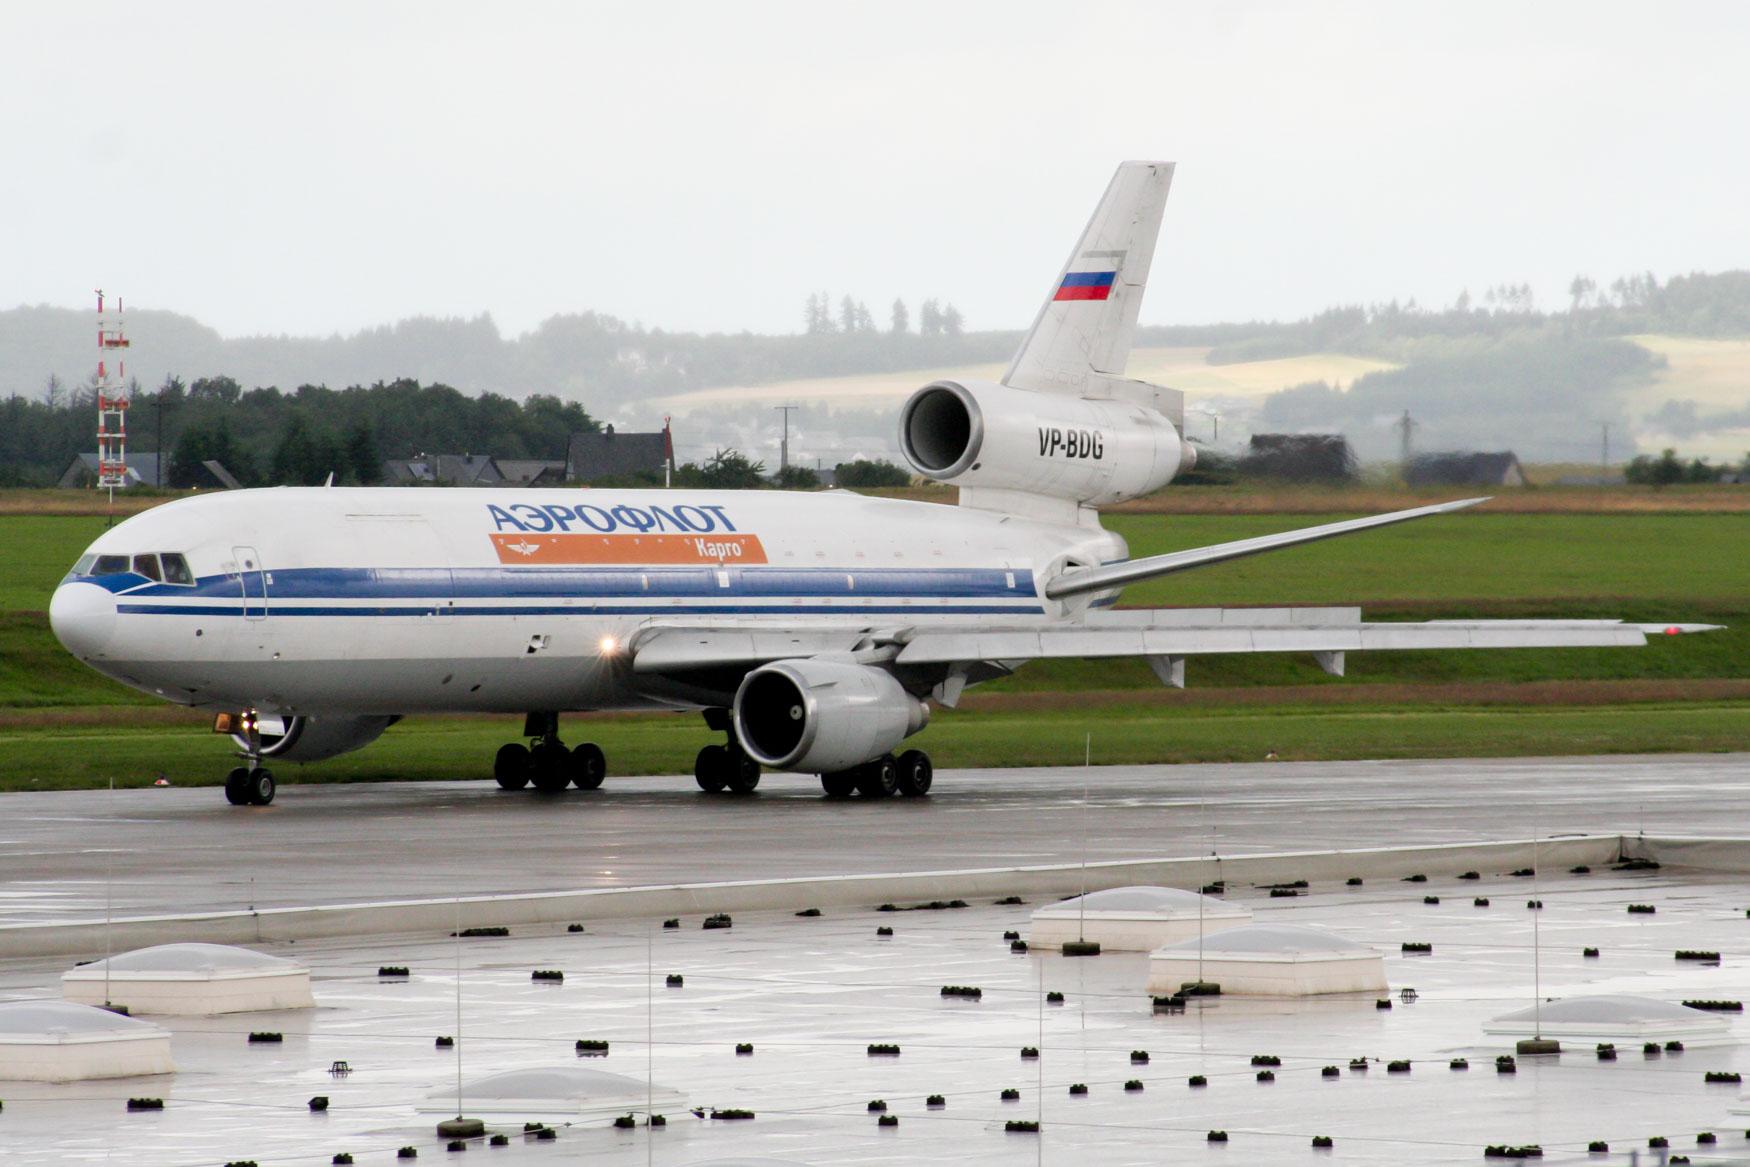 Aeroflot Cargo DC-10